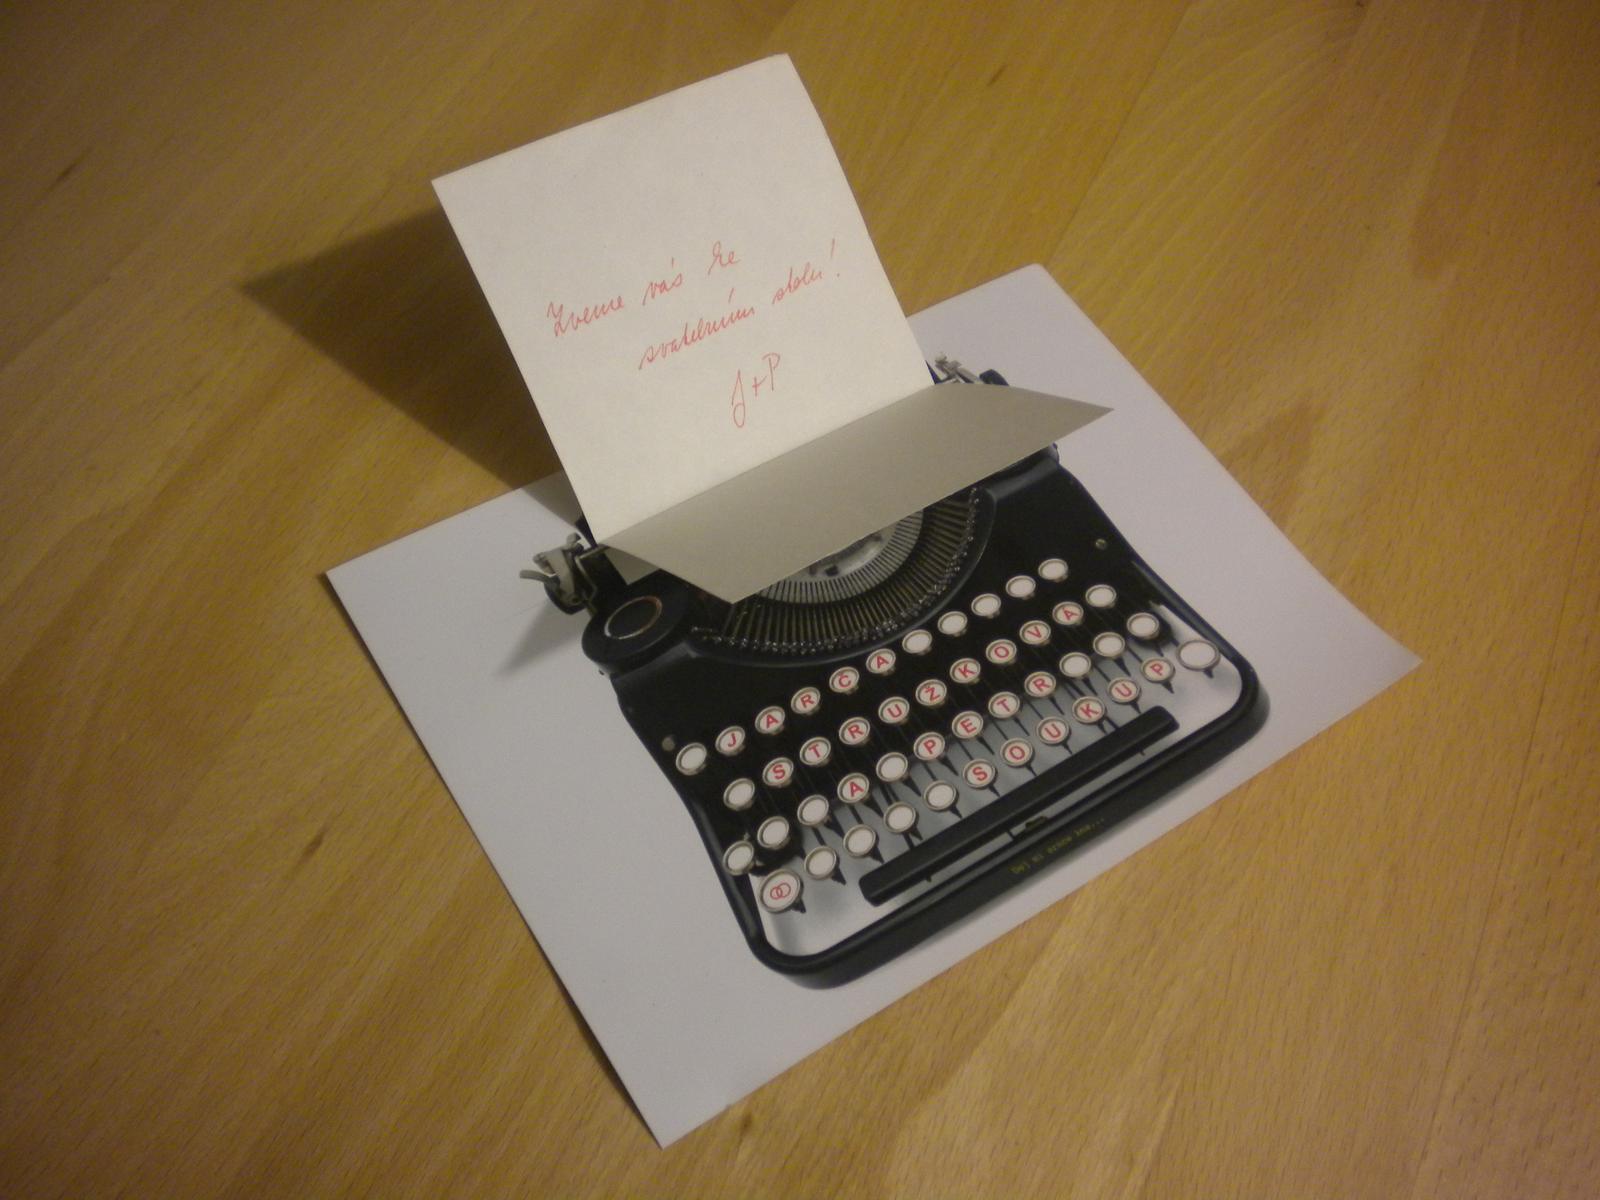 Tu je můj vynález.... - Obrázok č. 2